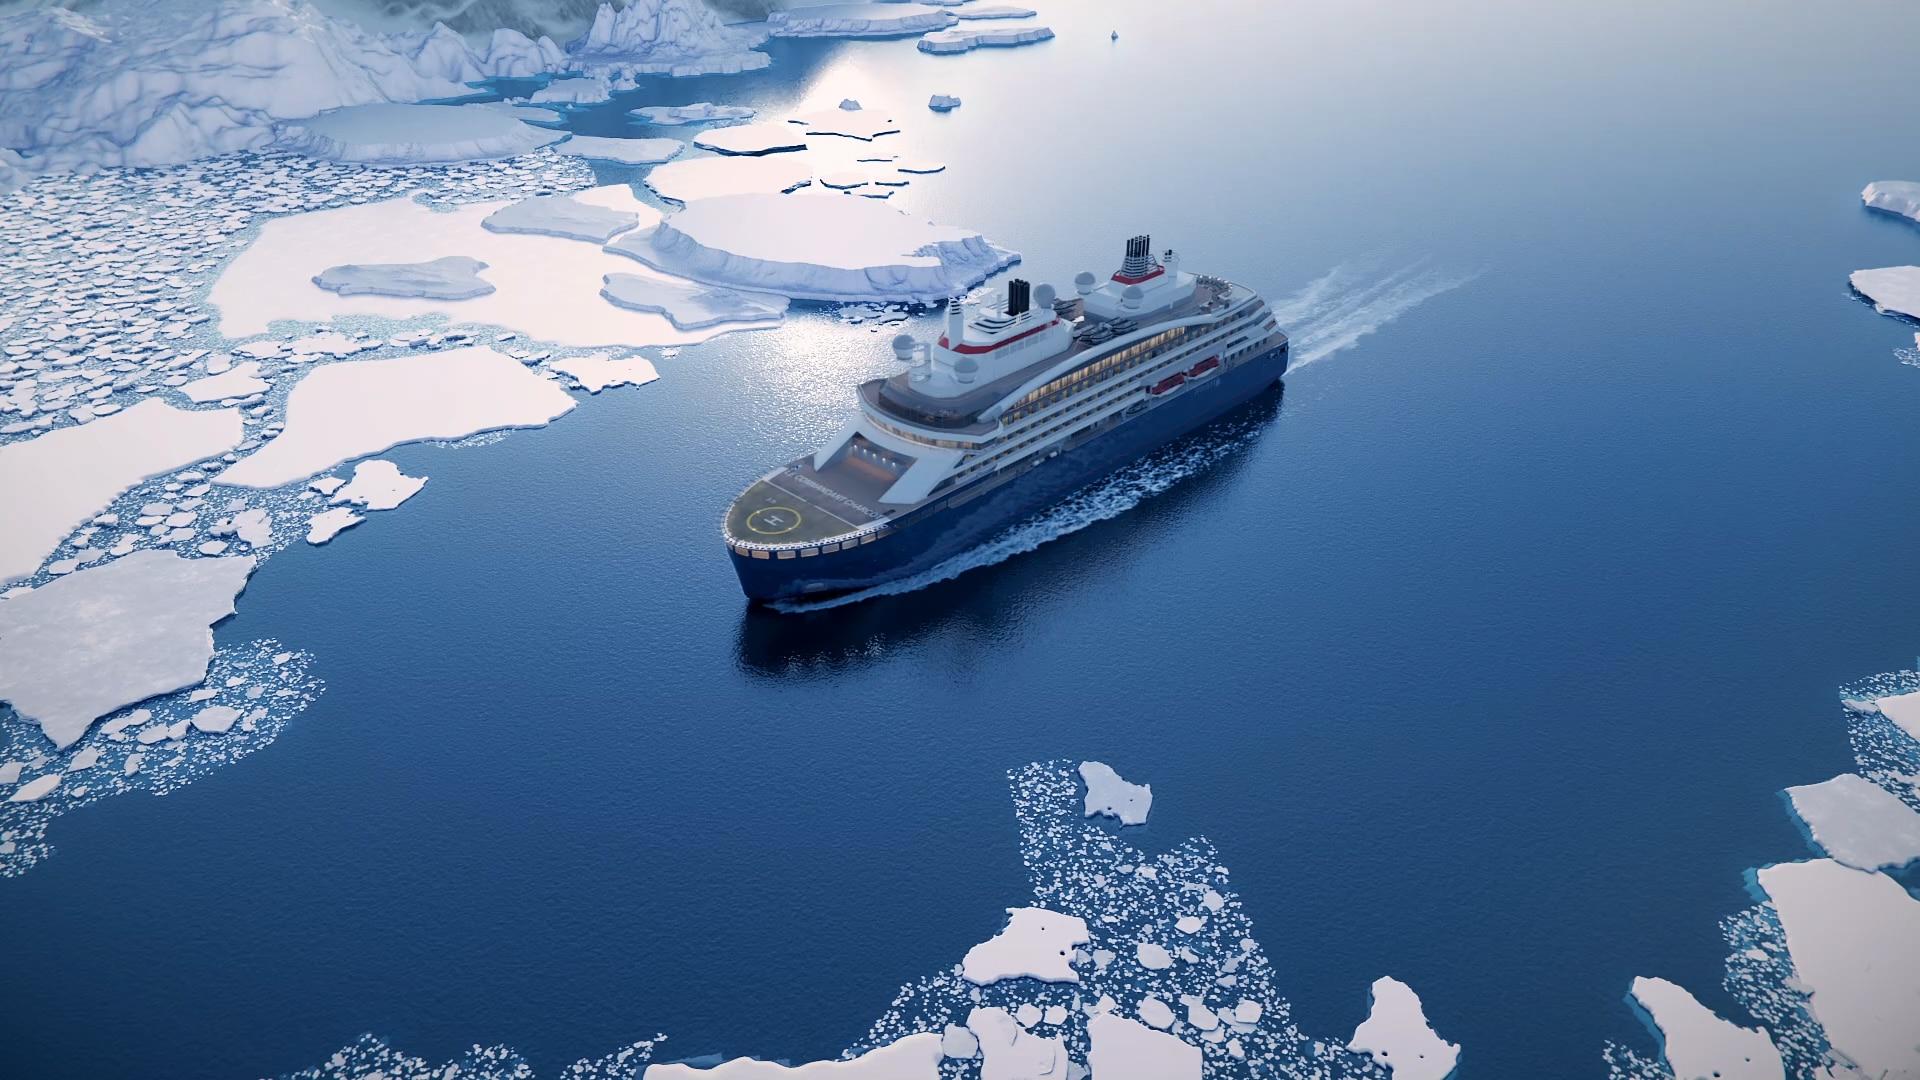 Le Commandant Charcot, a cruise ship designed for polar exploration